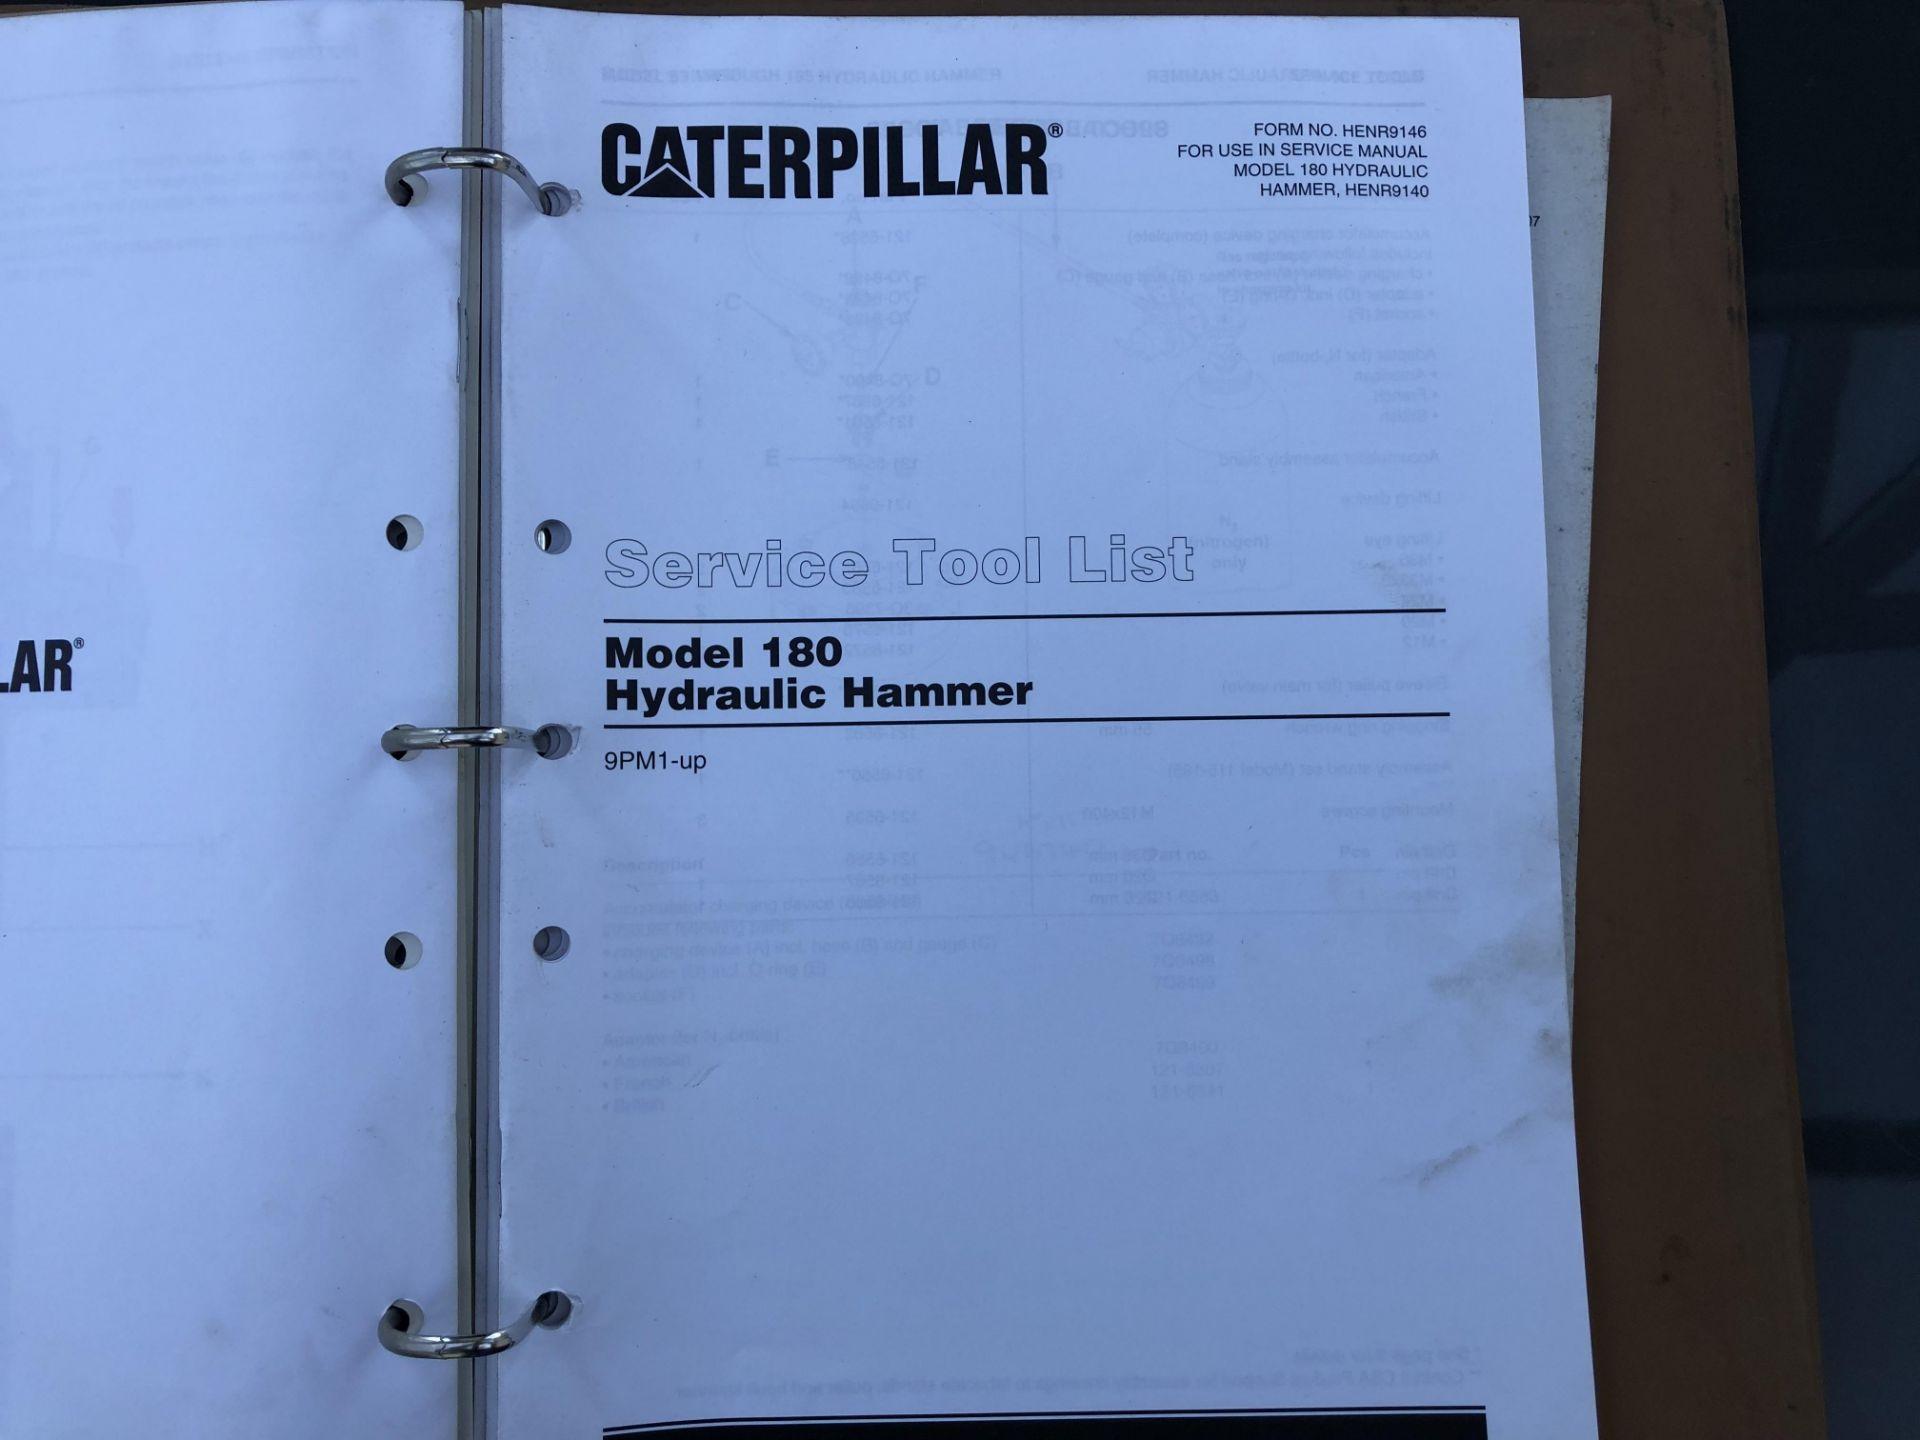 CATERPILLAR MODEL 180 HAMMER SERVICE MANUAL, GENUINE FACTORY CAT WORKSHOP MANUAL - Image 6 of 8